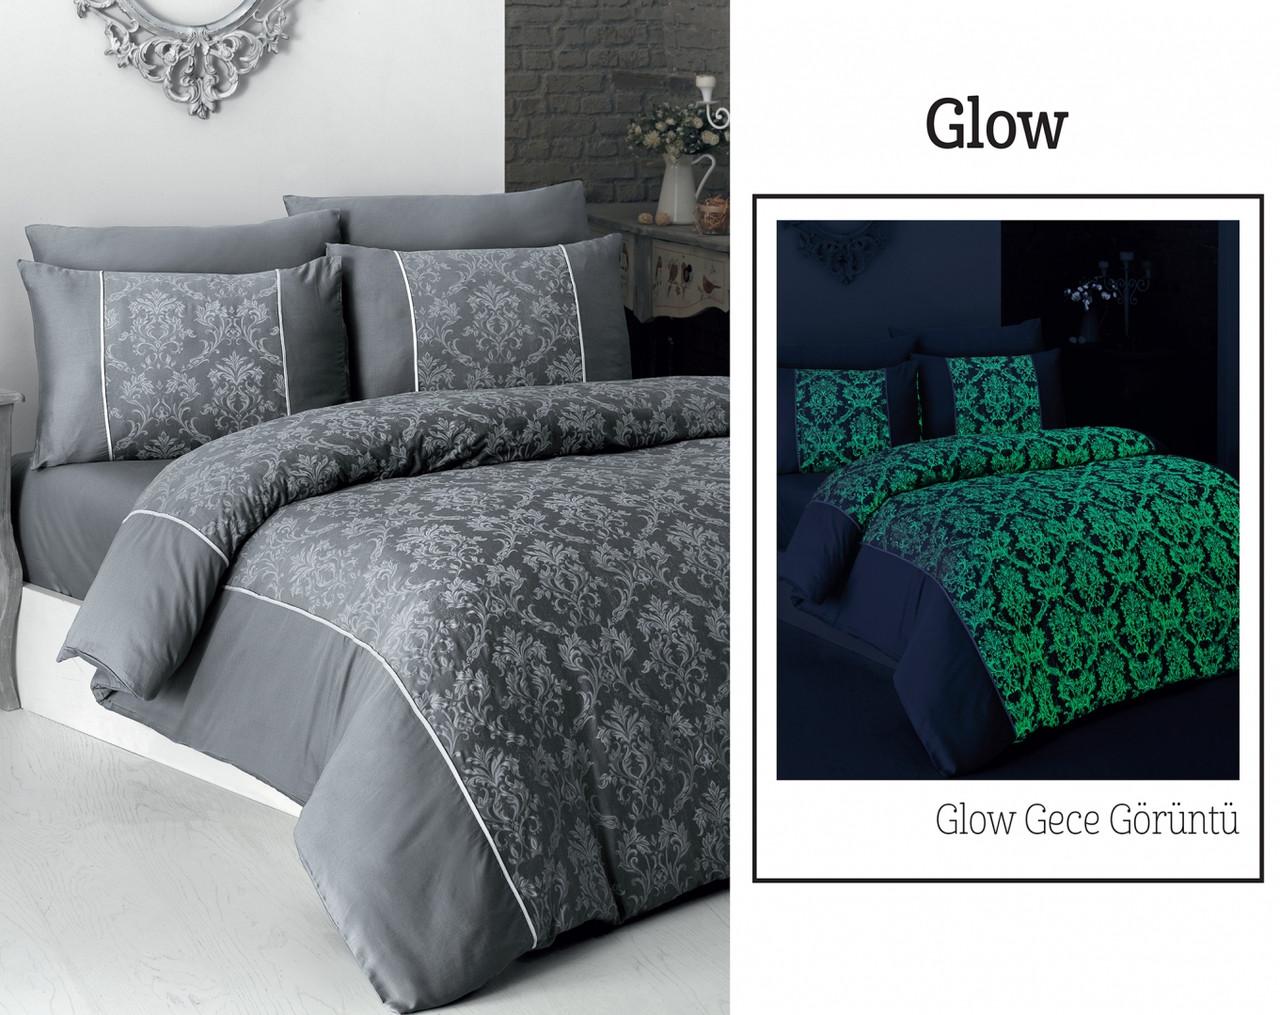 Постельное белье First Choice 200х220 V.I.P Moon light сатин Glow серый